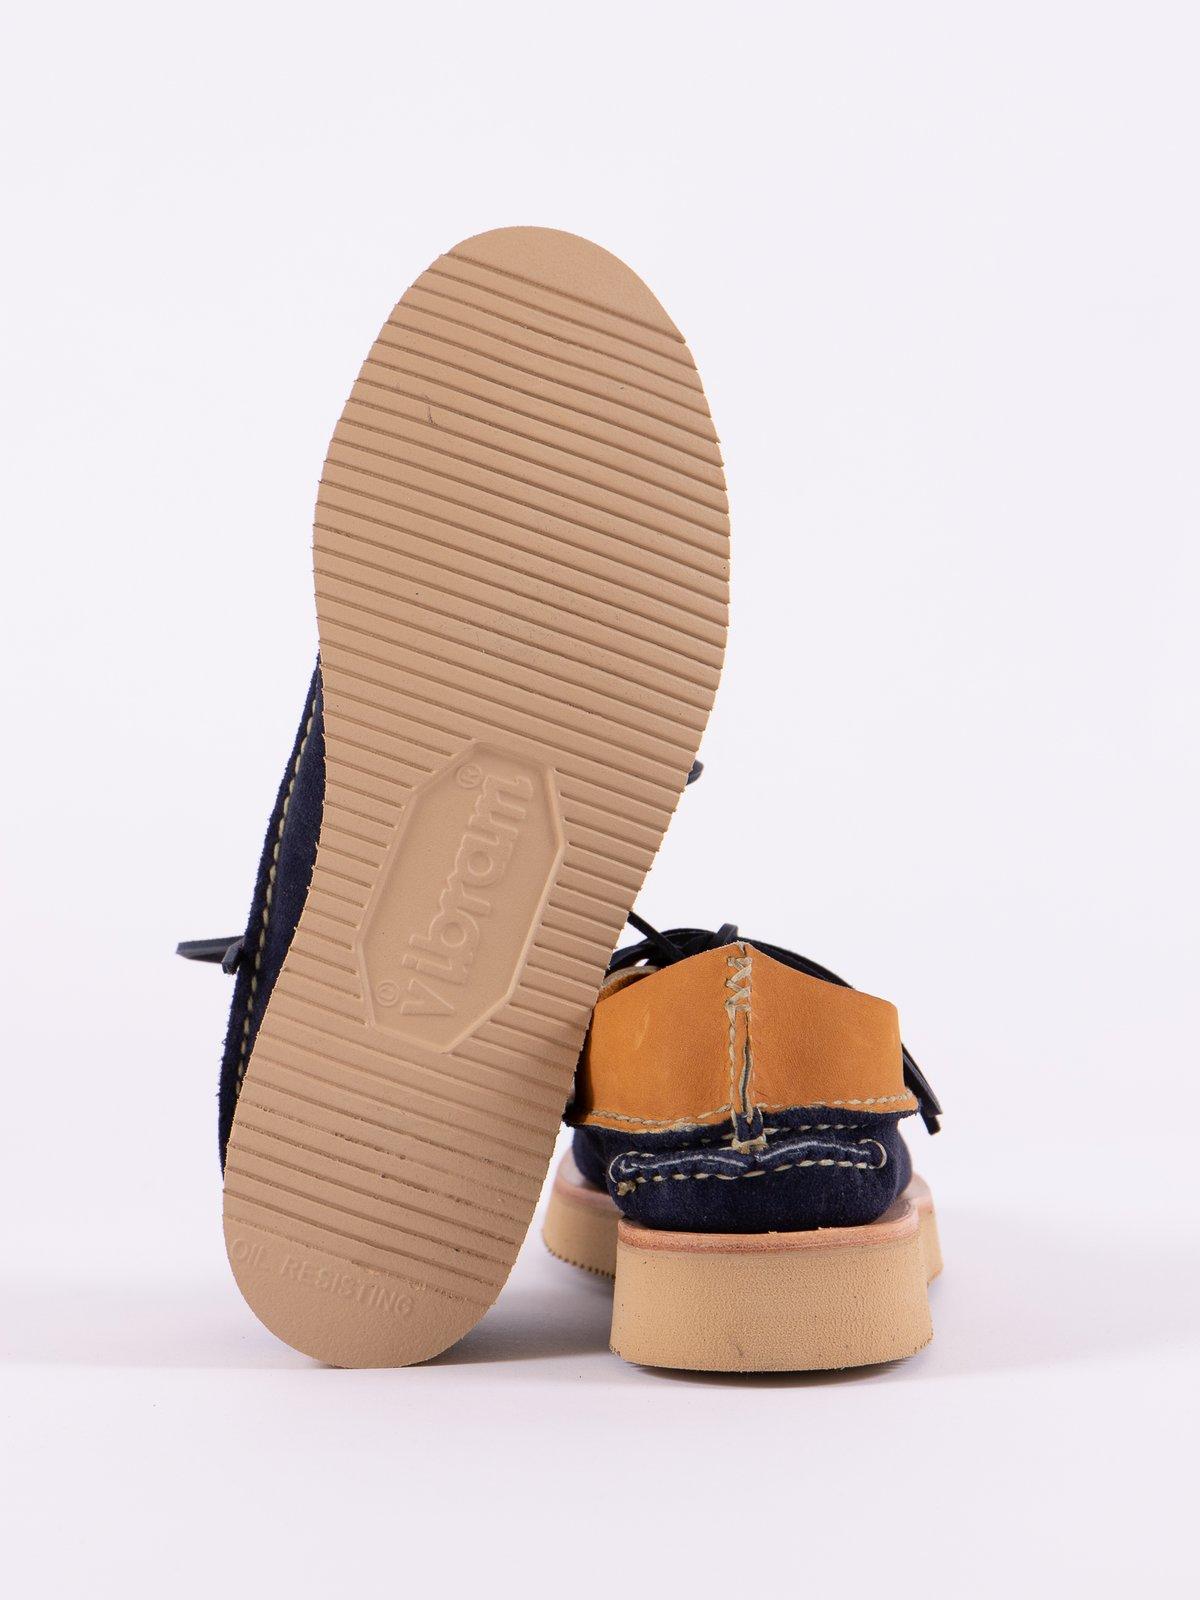 Indigo/Tan All Handsewn Sneaker Moc Ox Exclusive - Image 5